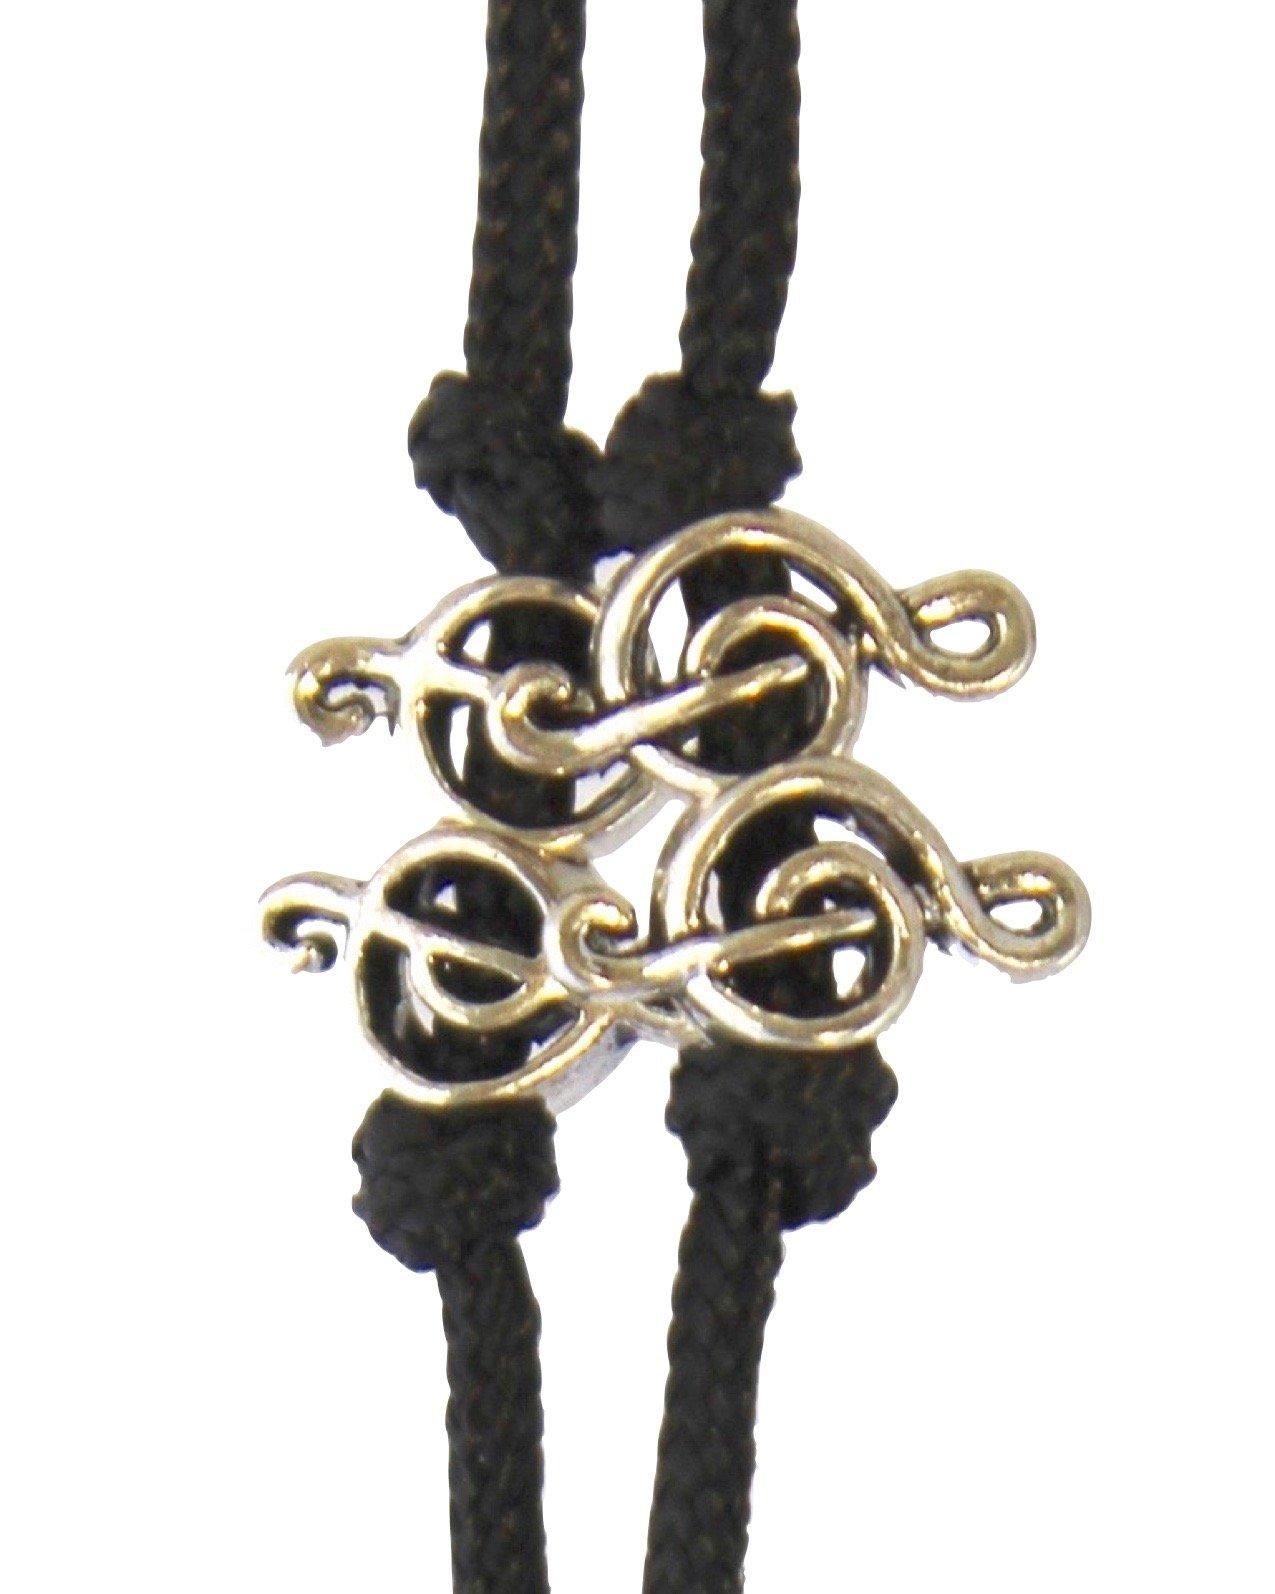 Sherrin's Threads Corded Neck Strap - Treble Clef